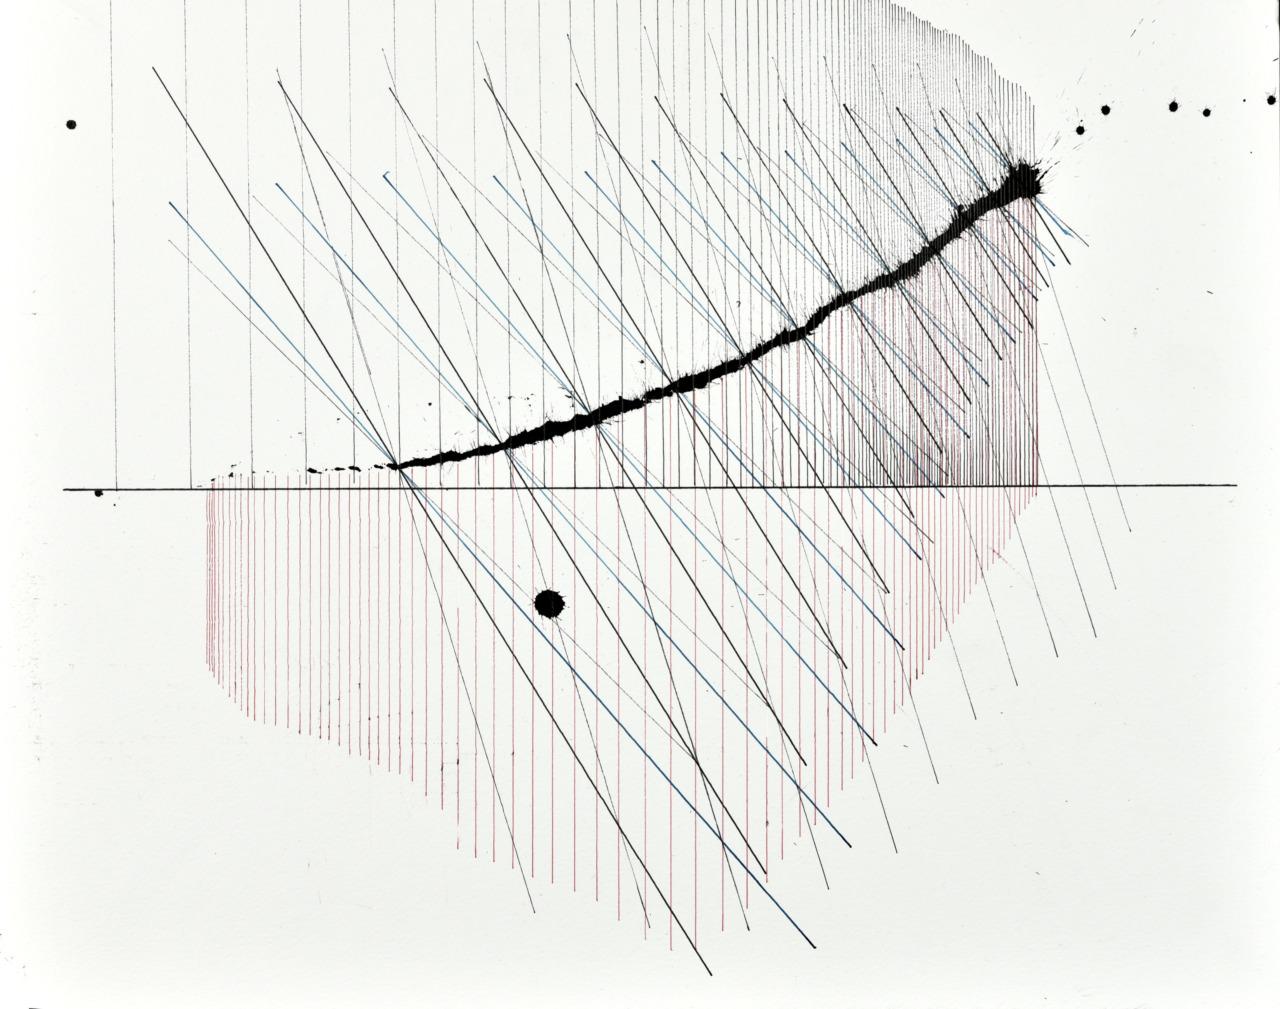 op200520. acrylic on paper, 40x50cm